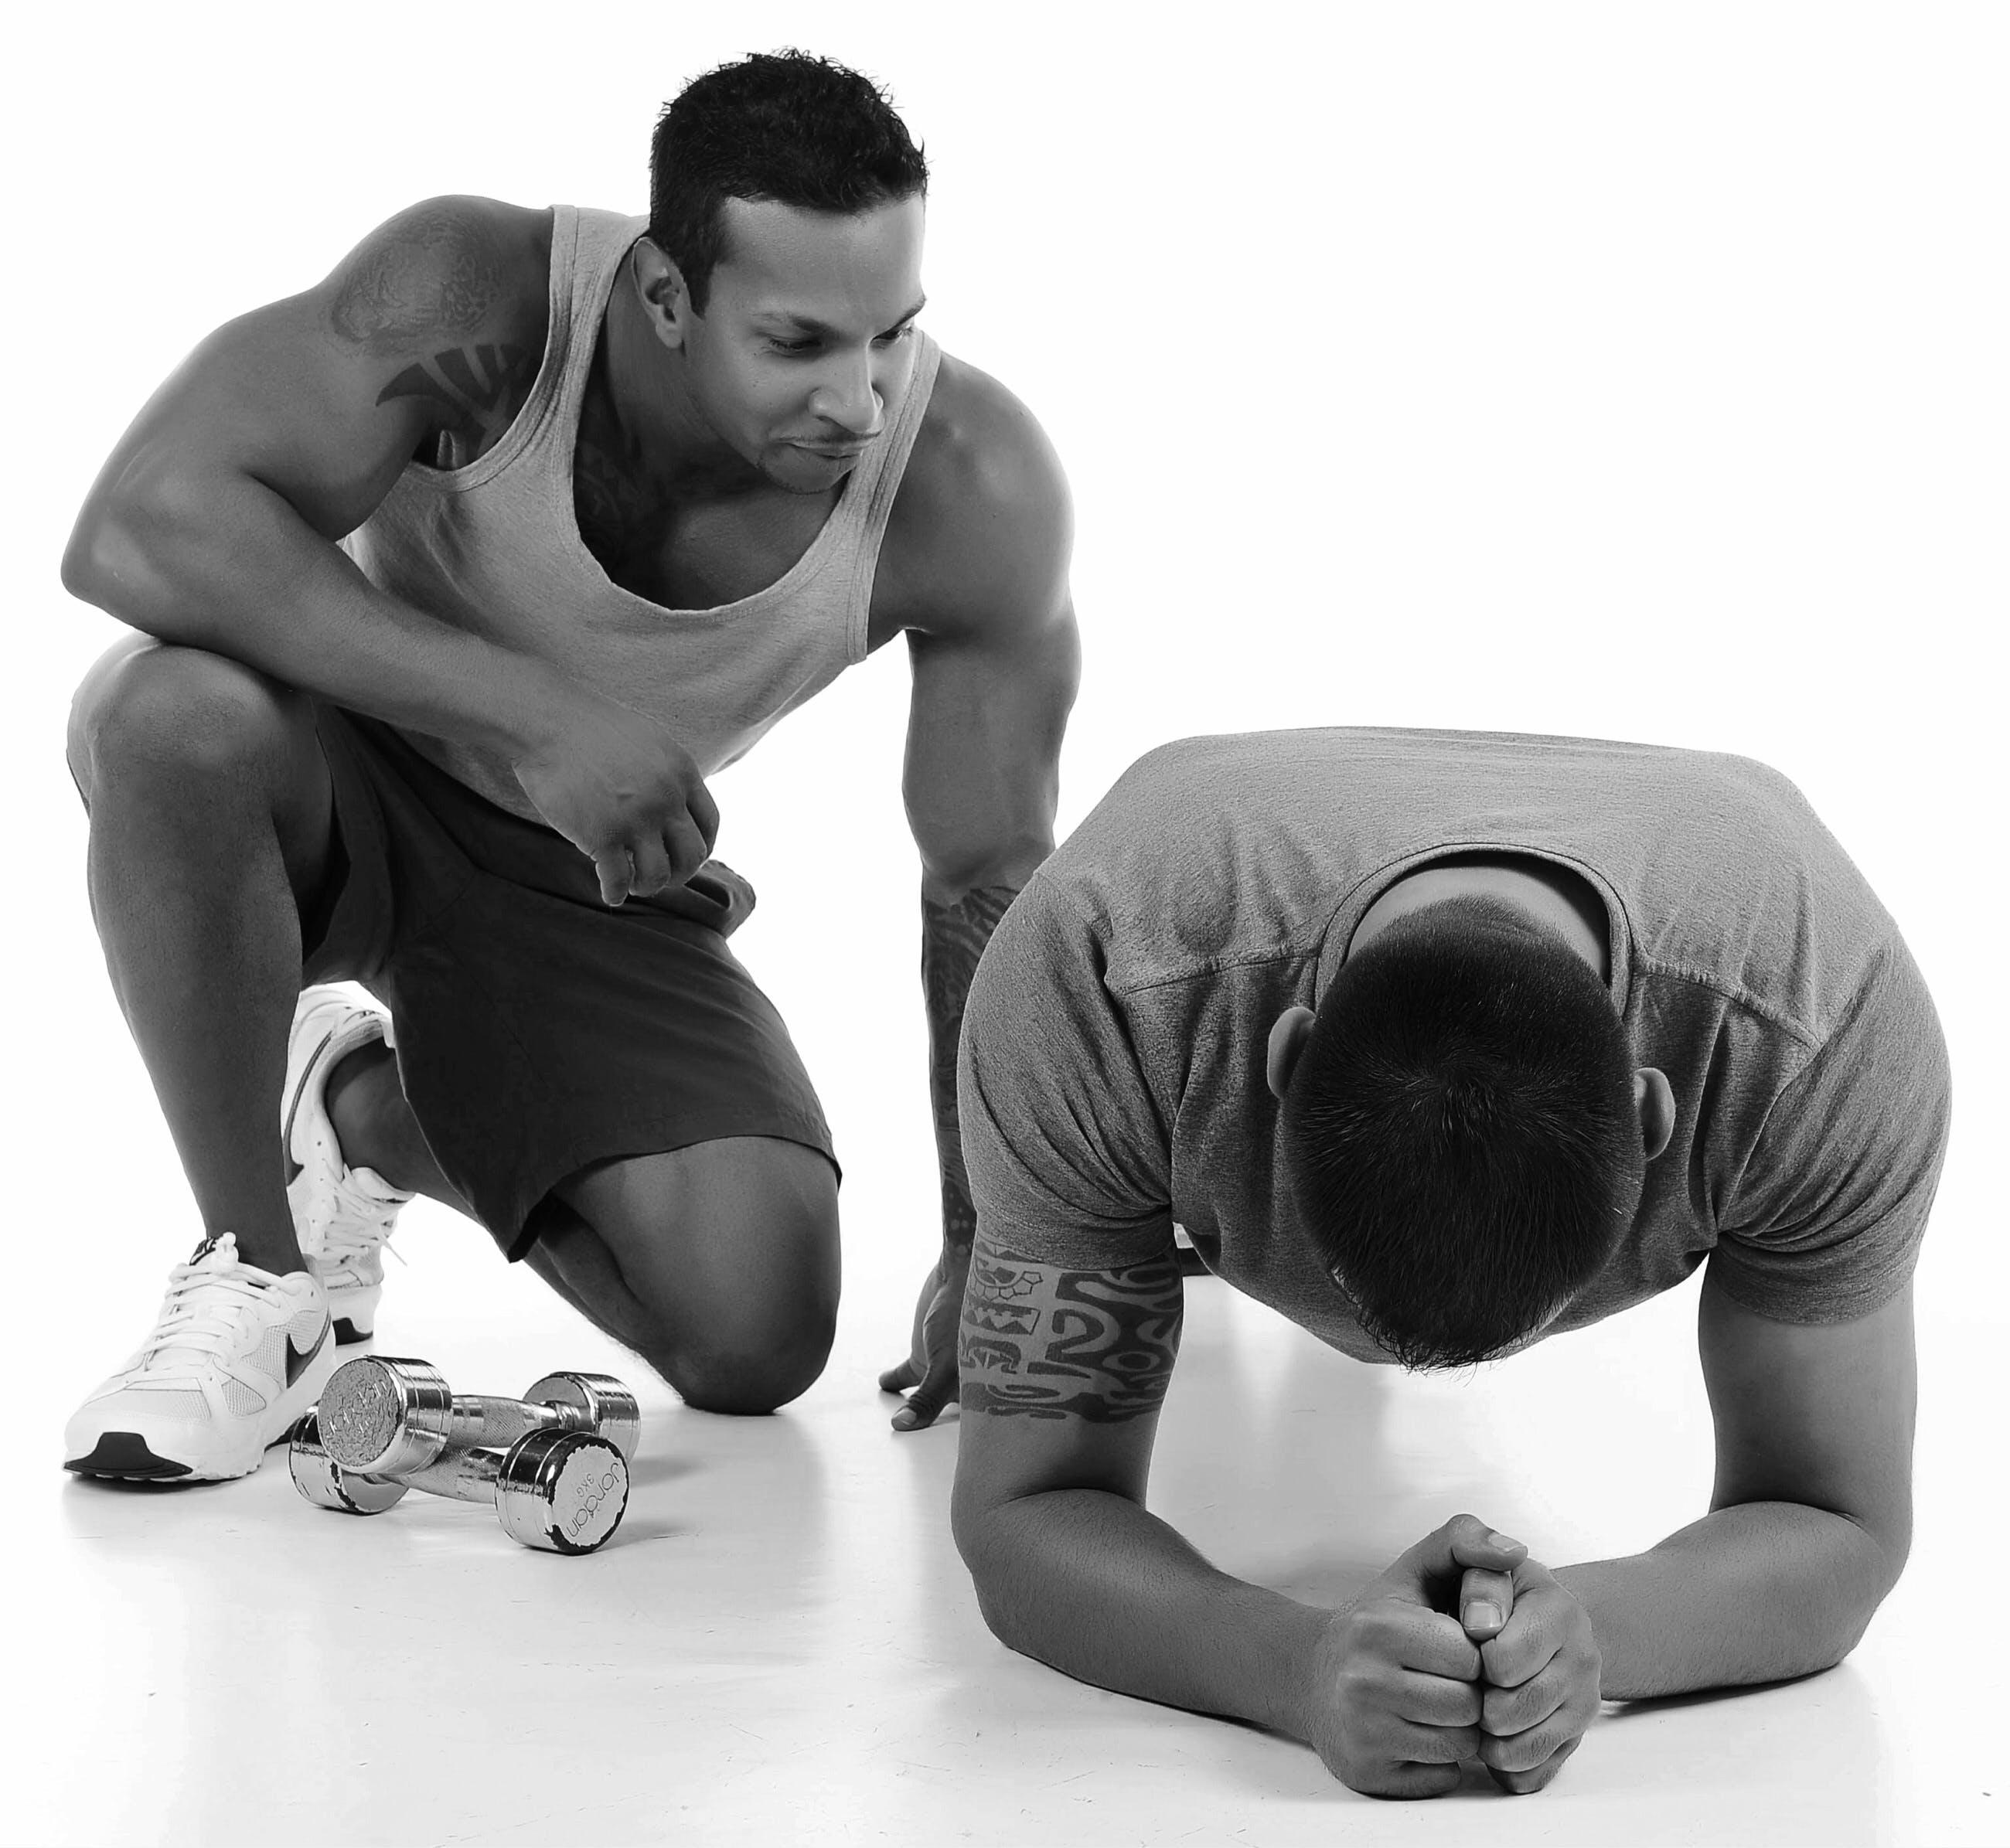 Free stock photo of fitness, training, gym